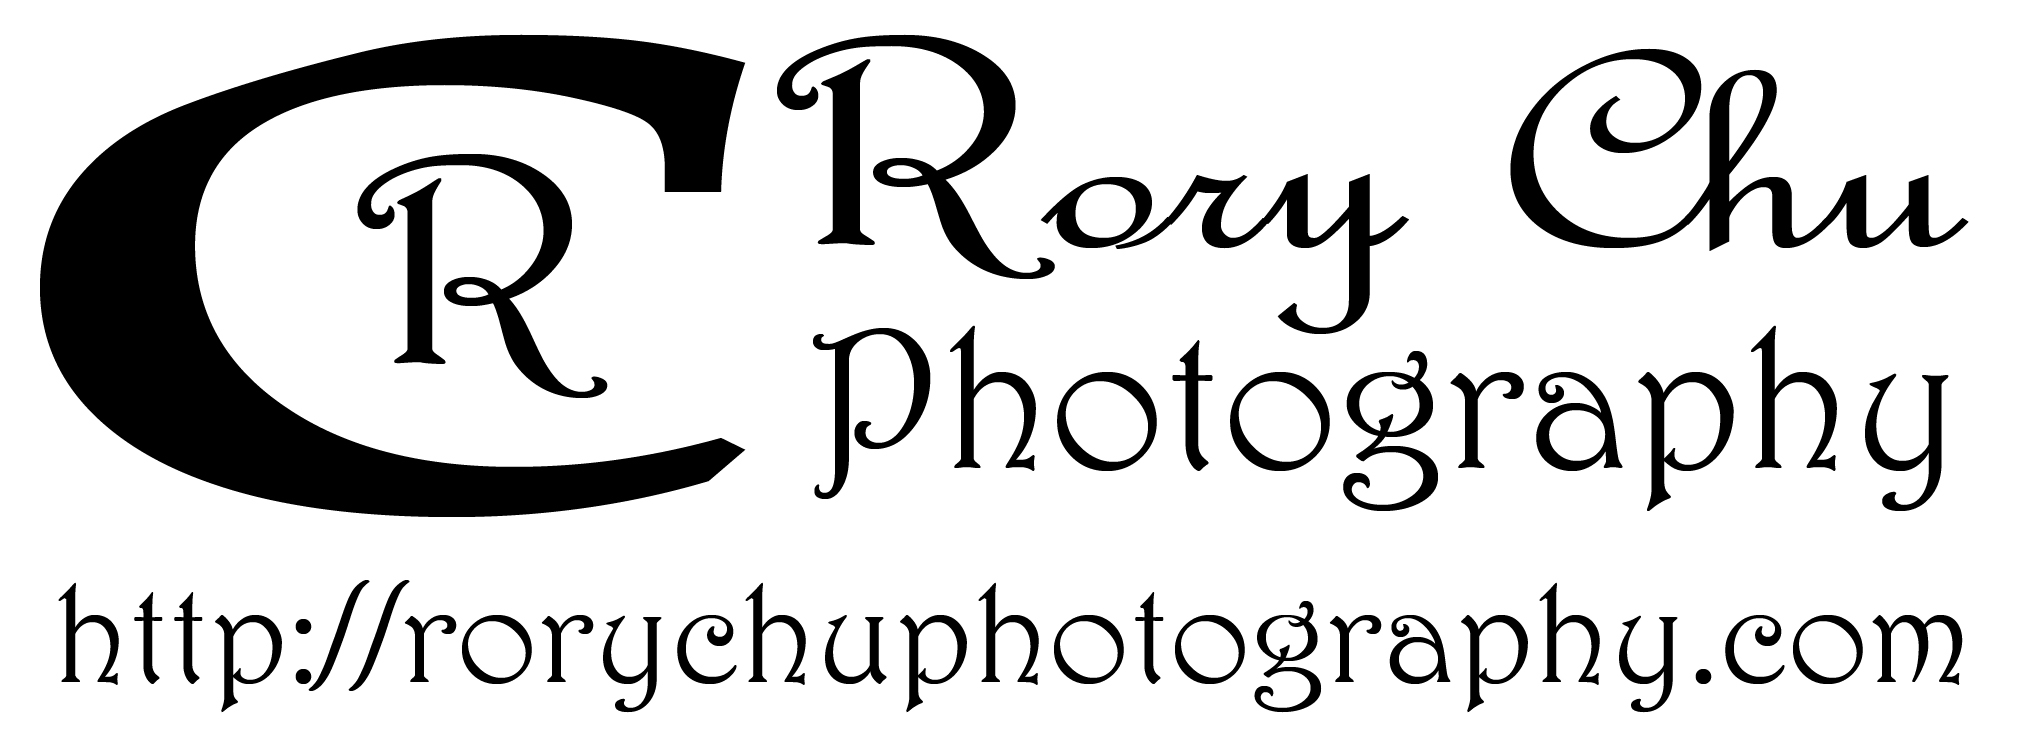 Rory Chu Photography